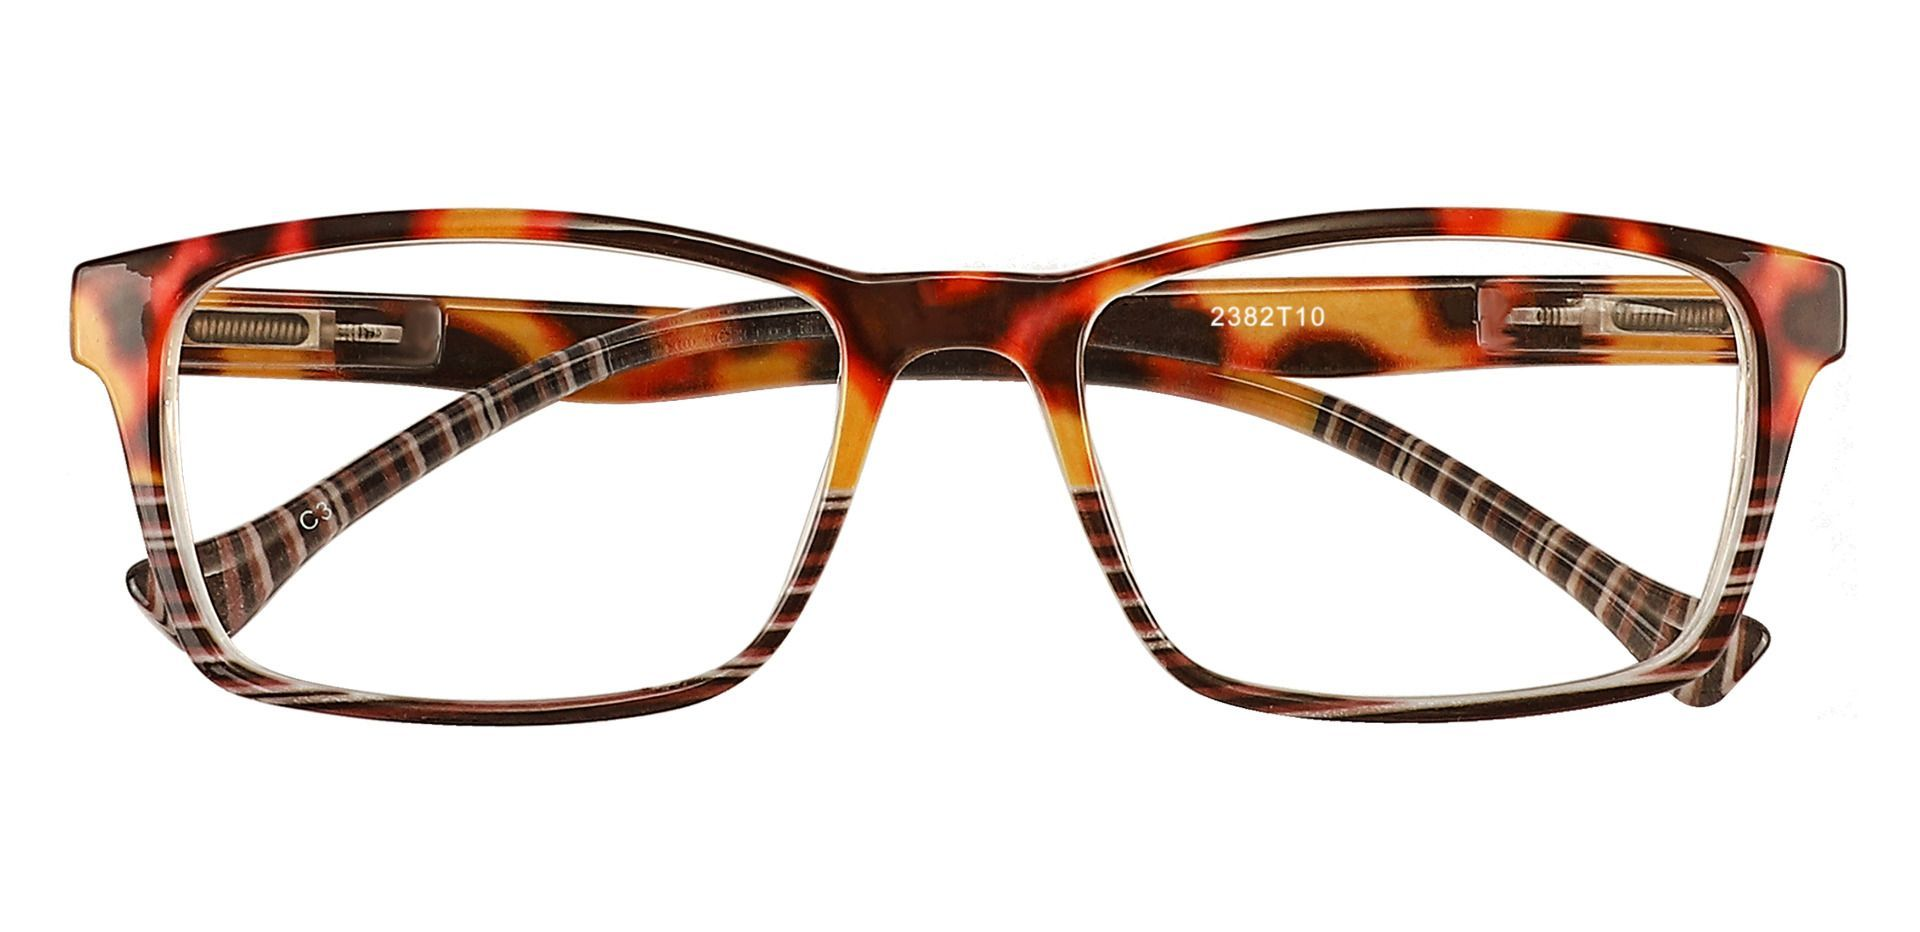 Booth Rectangle Prescription Glasses - Tortoise